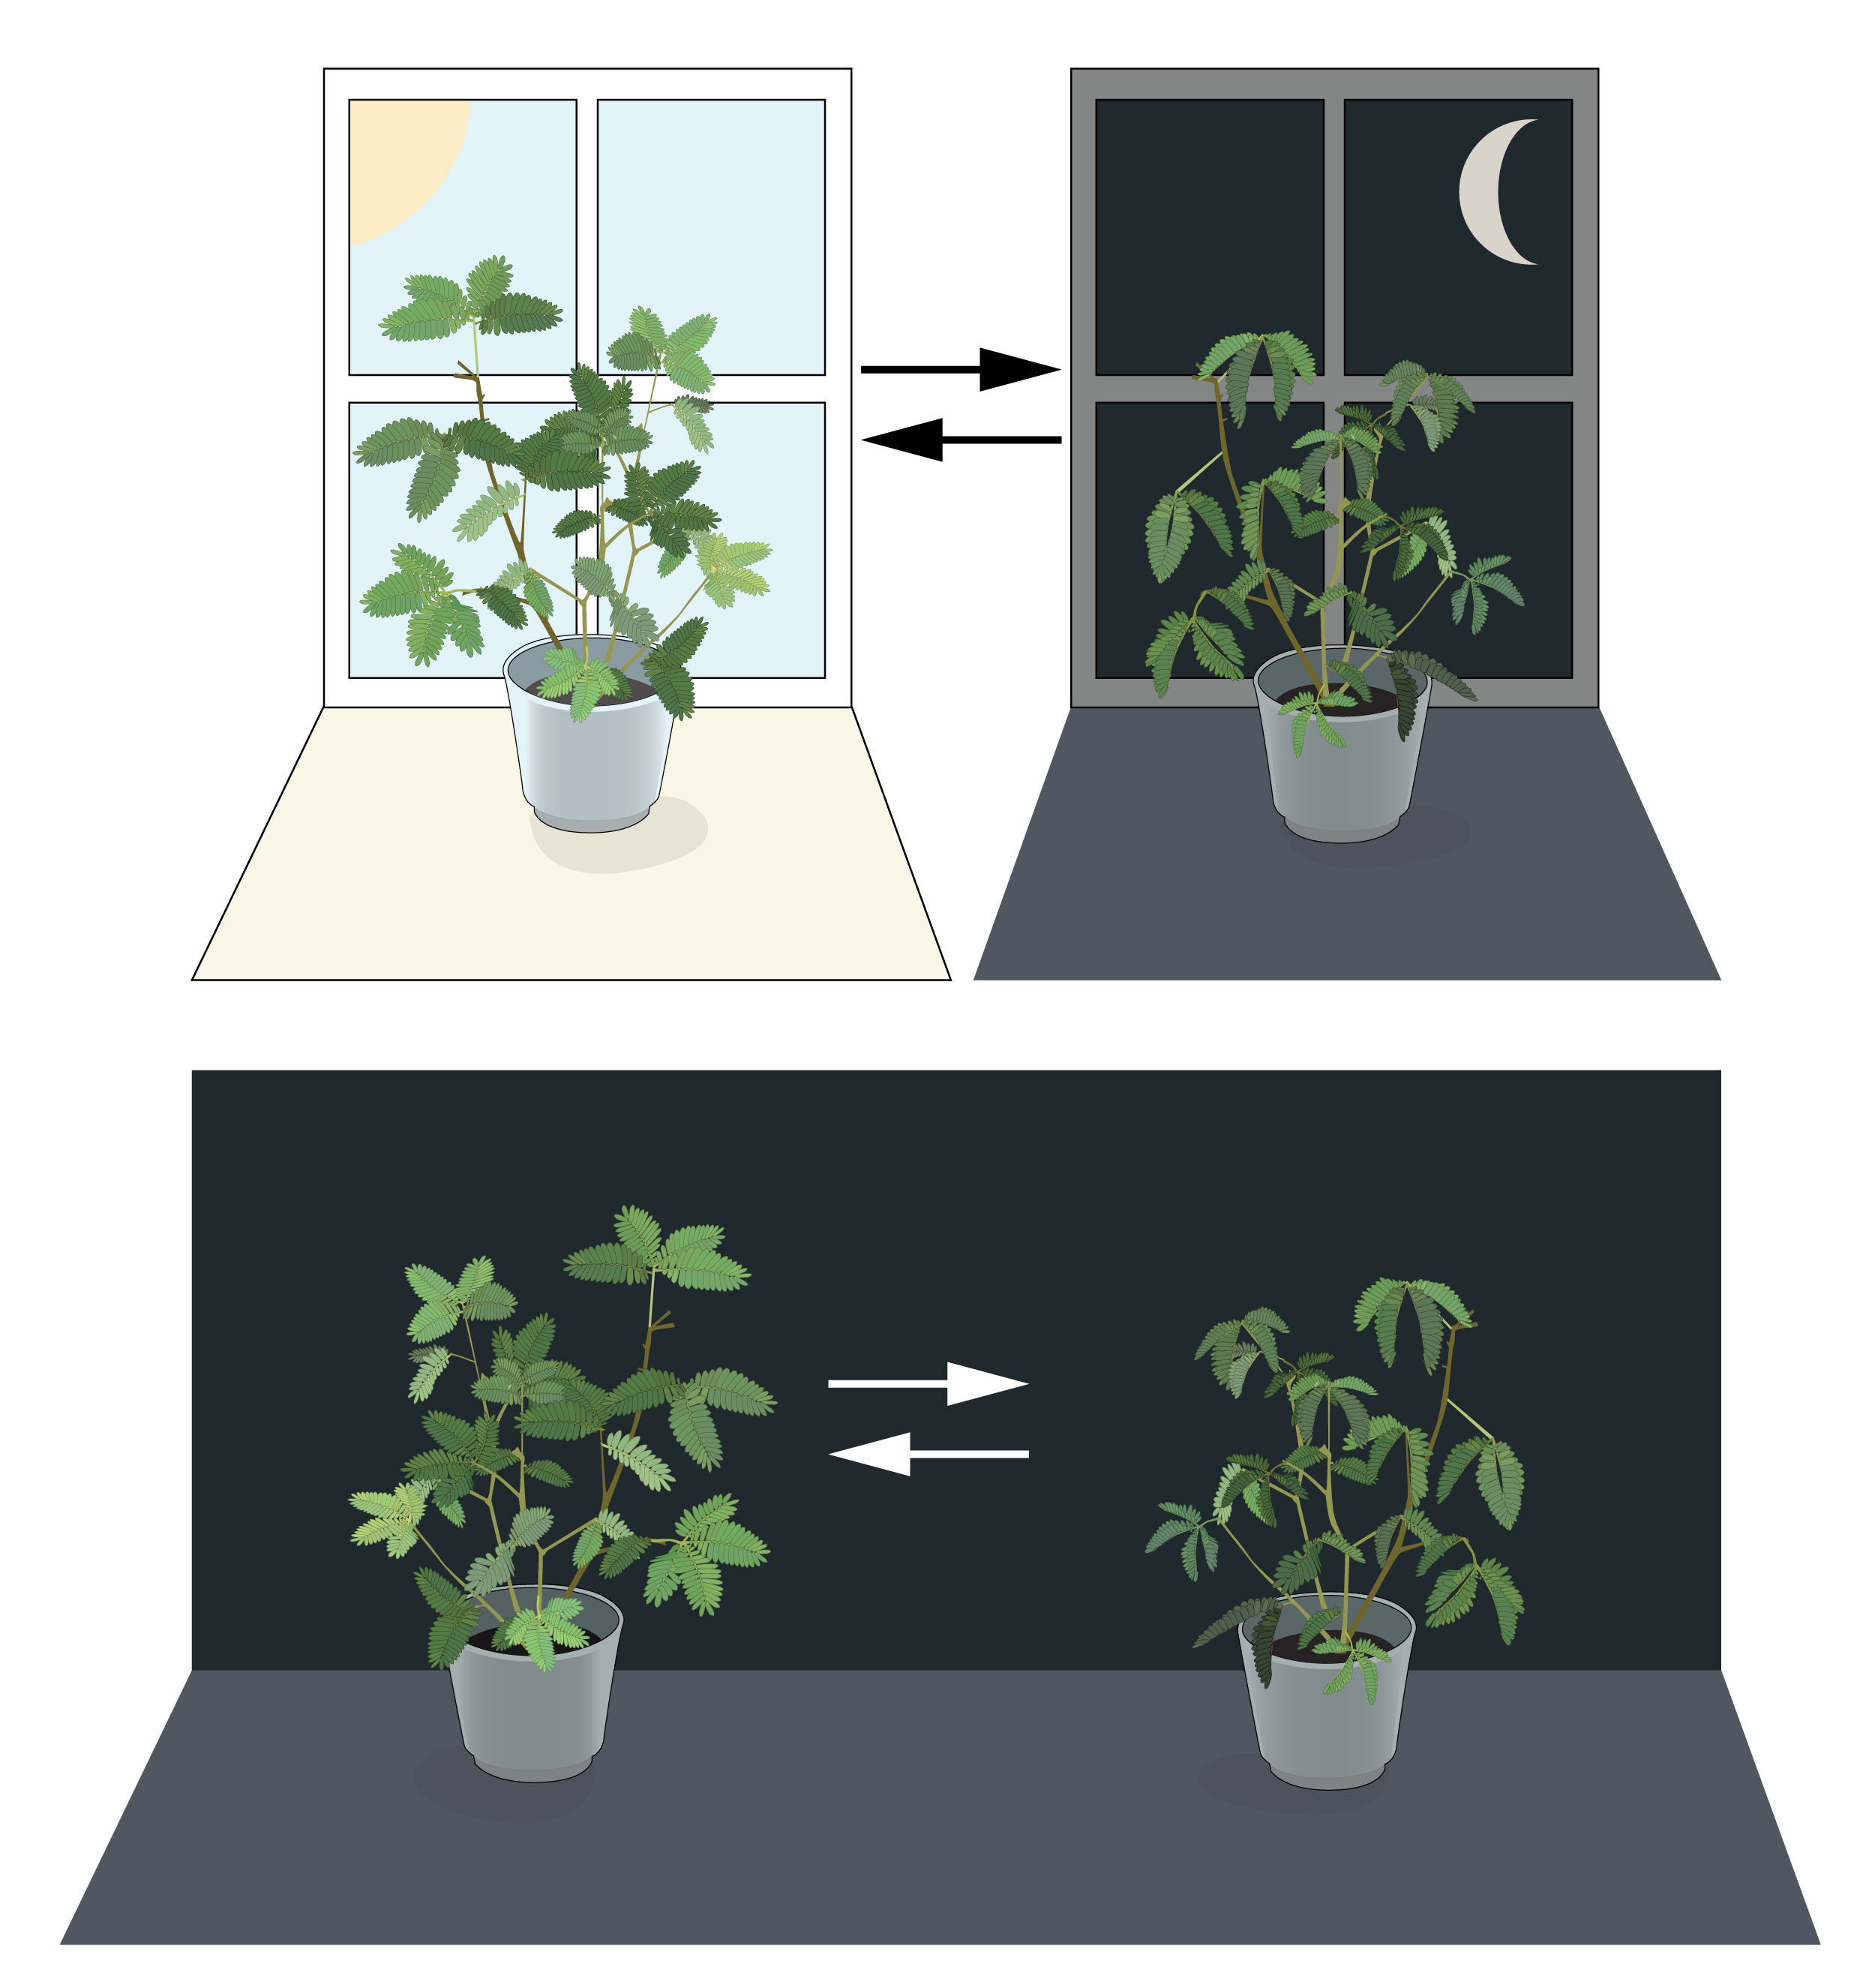 Mimosa plants